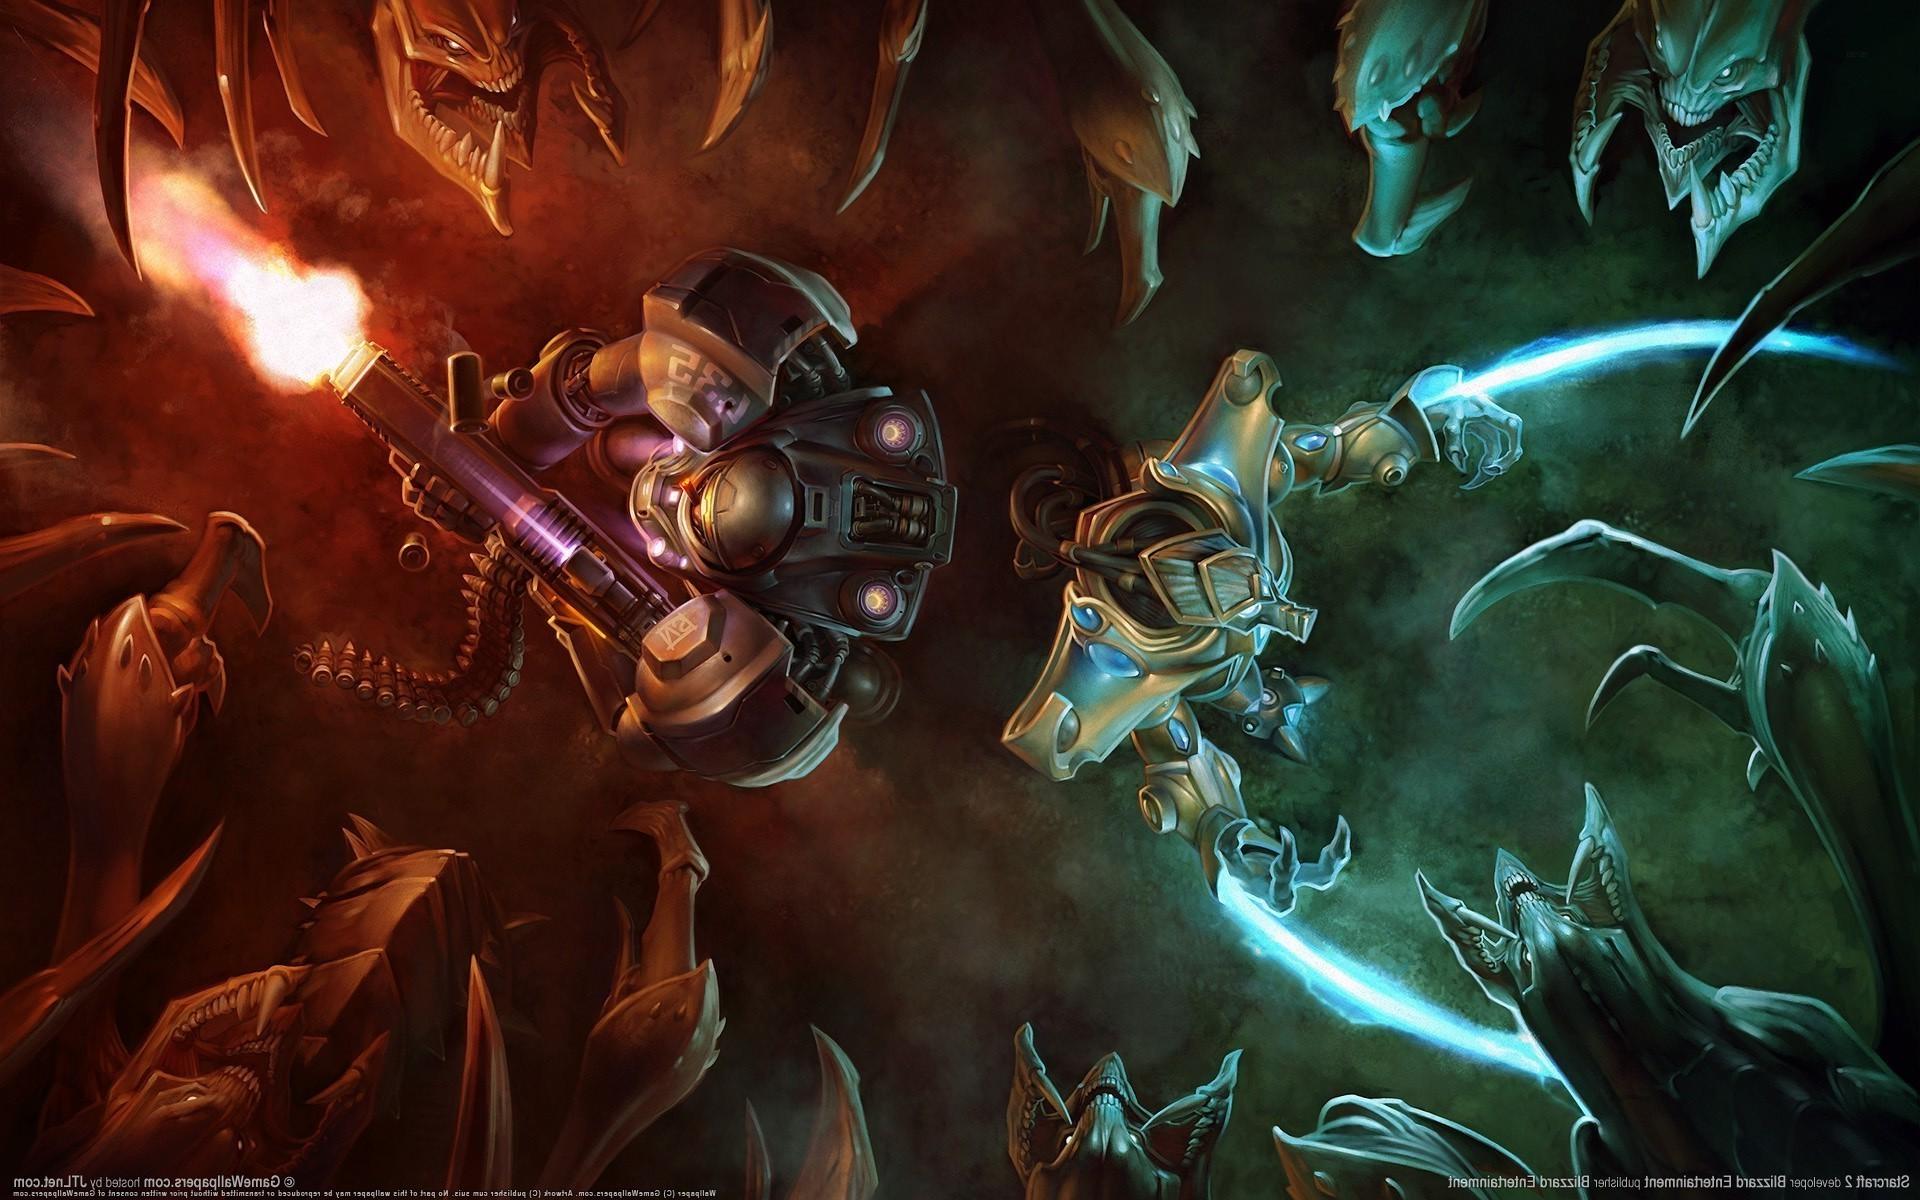 Starcraft 2 Zerg Wallpaper (73+ images)